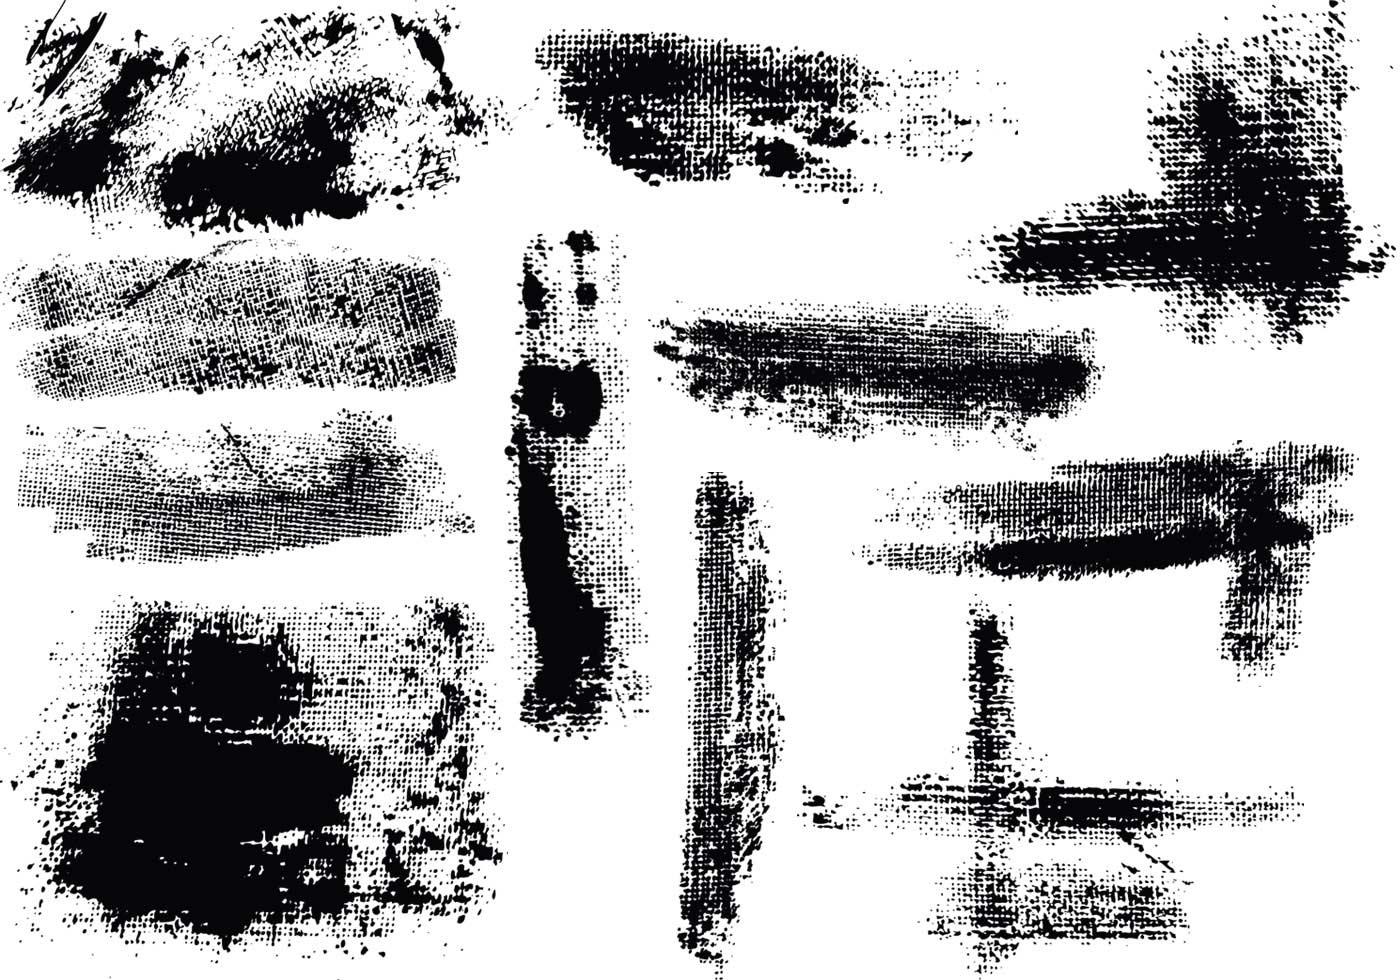 Grunge Texture Vector Pack - Download Free Vectors, Clipart Graphics & Vector Art